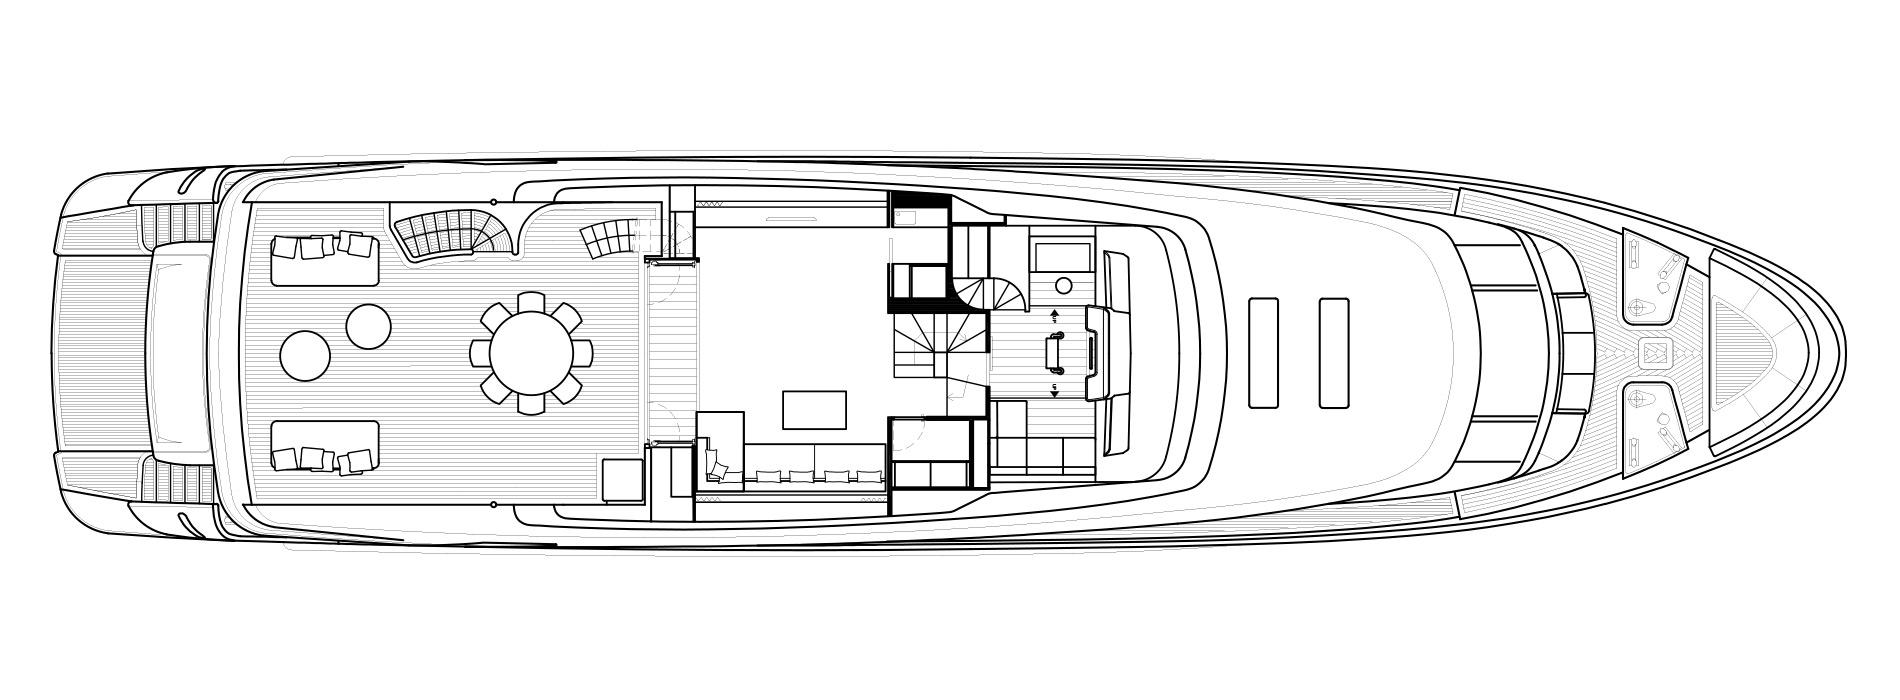 Sanlorenzo Yachts SD112 Bерхний палуба версия A